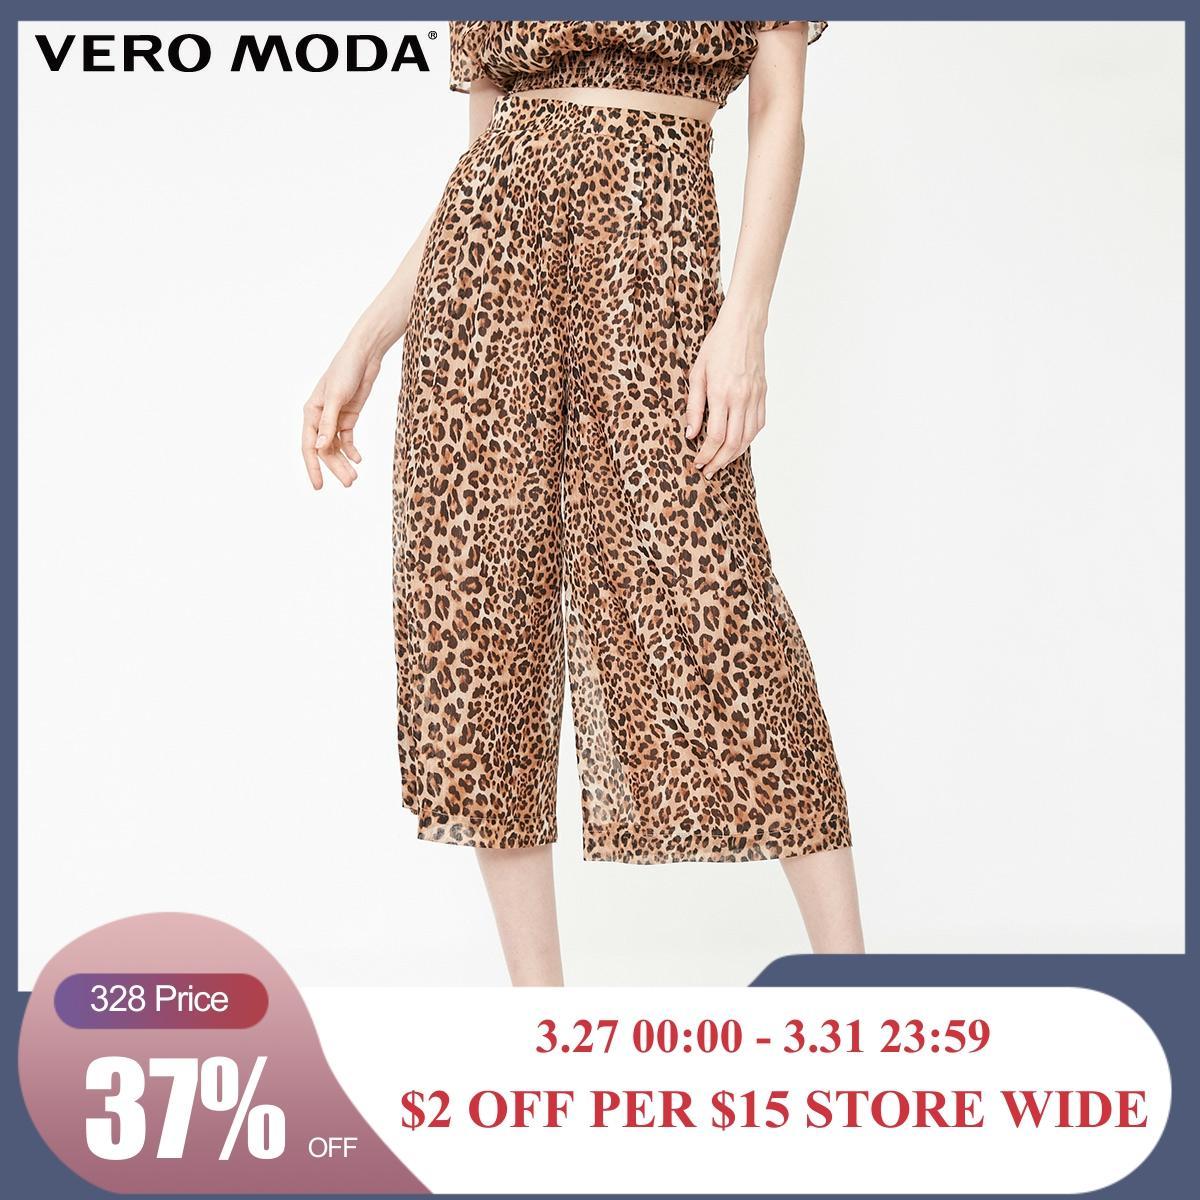 Vero Moda Women's Women's Leopard Print High-rise Capri Pants | 31926J529